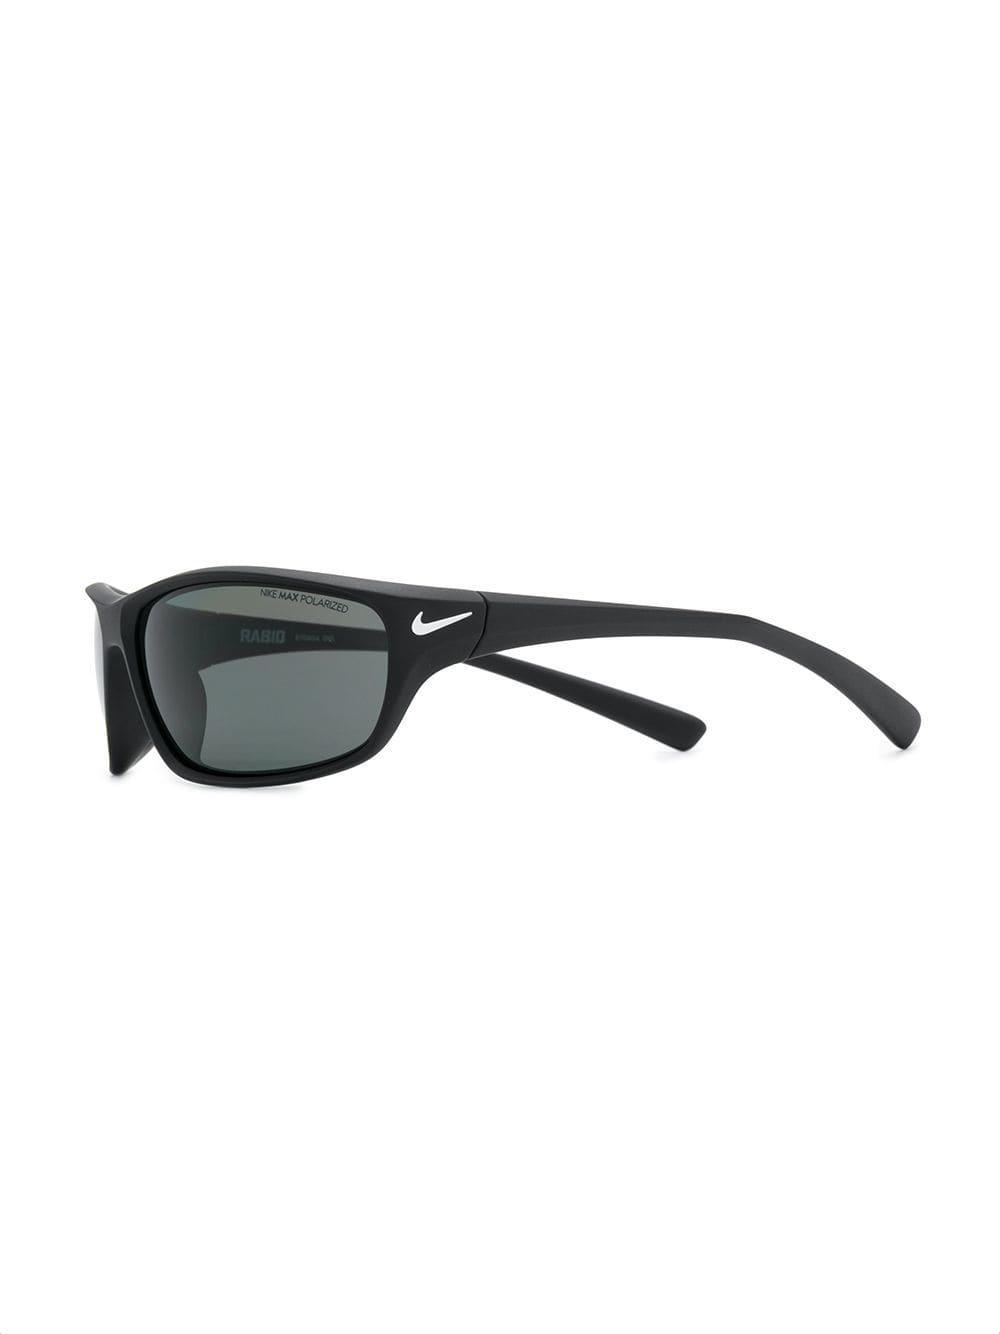 9ad4a98c45d Nike Rectangular Shaped Sunglasses in Black - Lyst